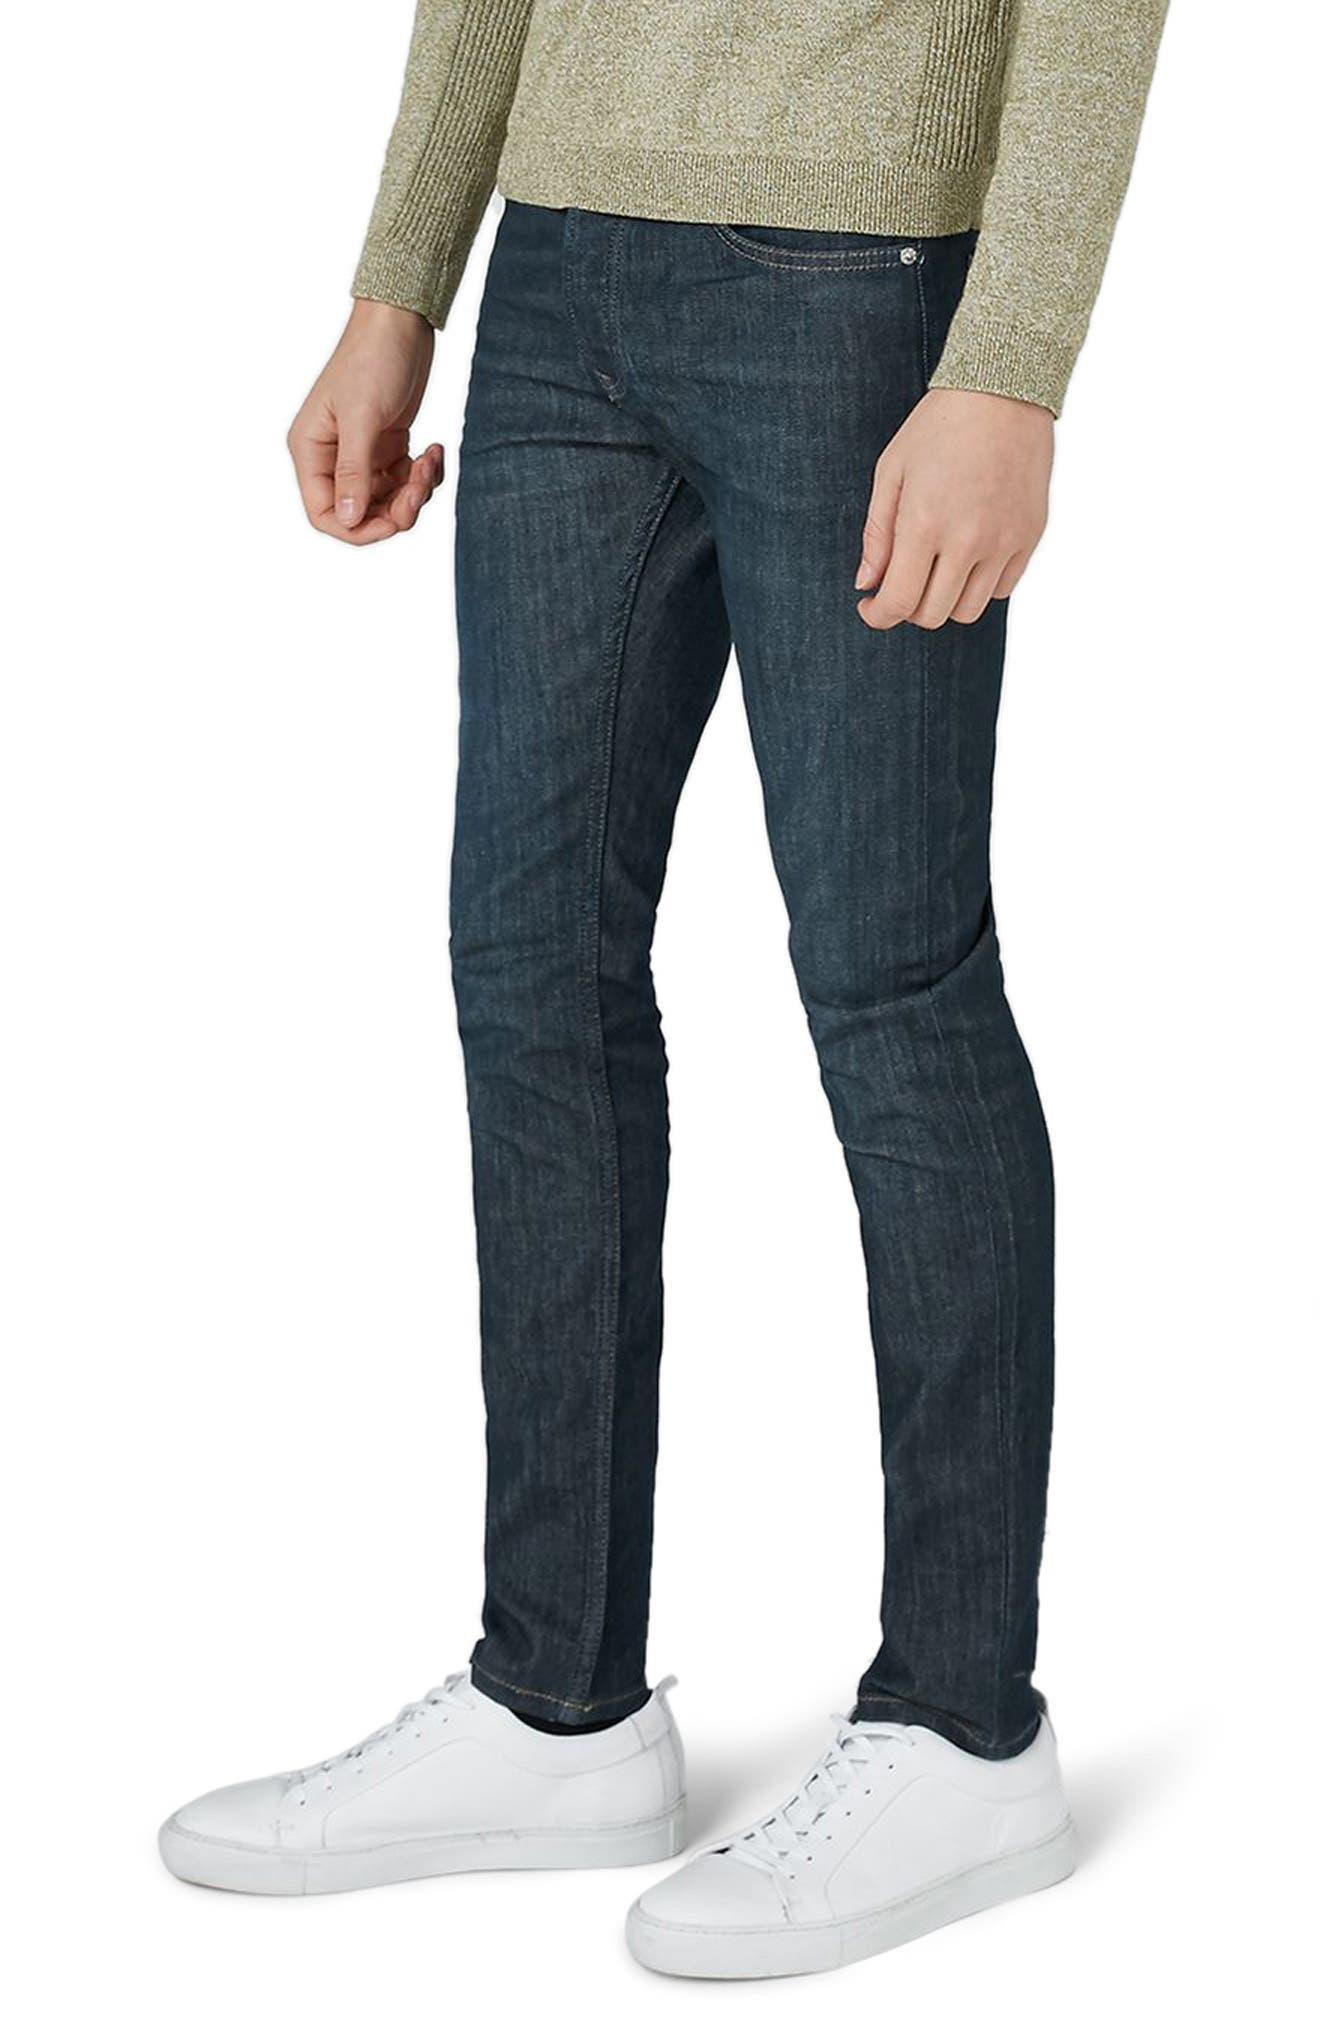 Coated Denim Skinny Jeans,                             Main thumbnail 1, color,                             BLUE